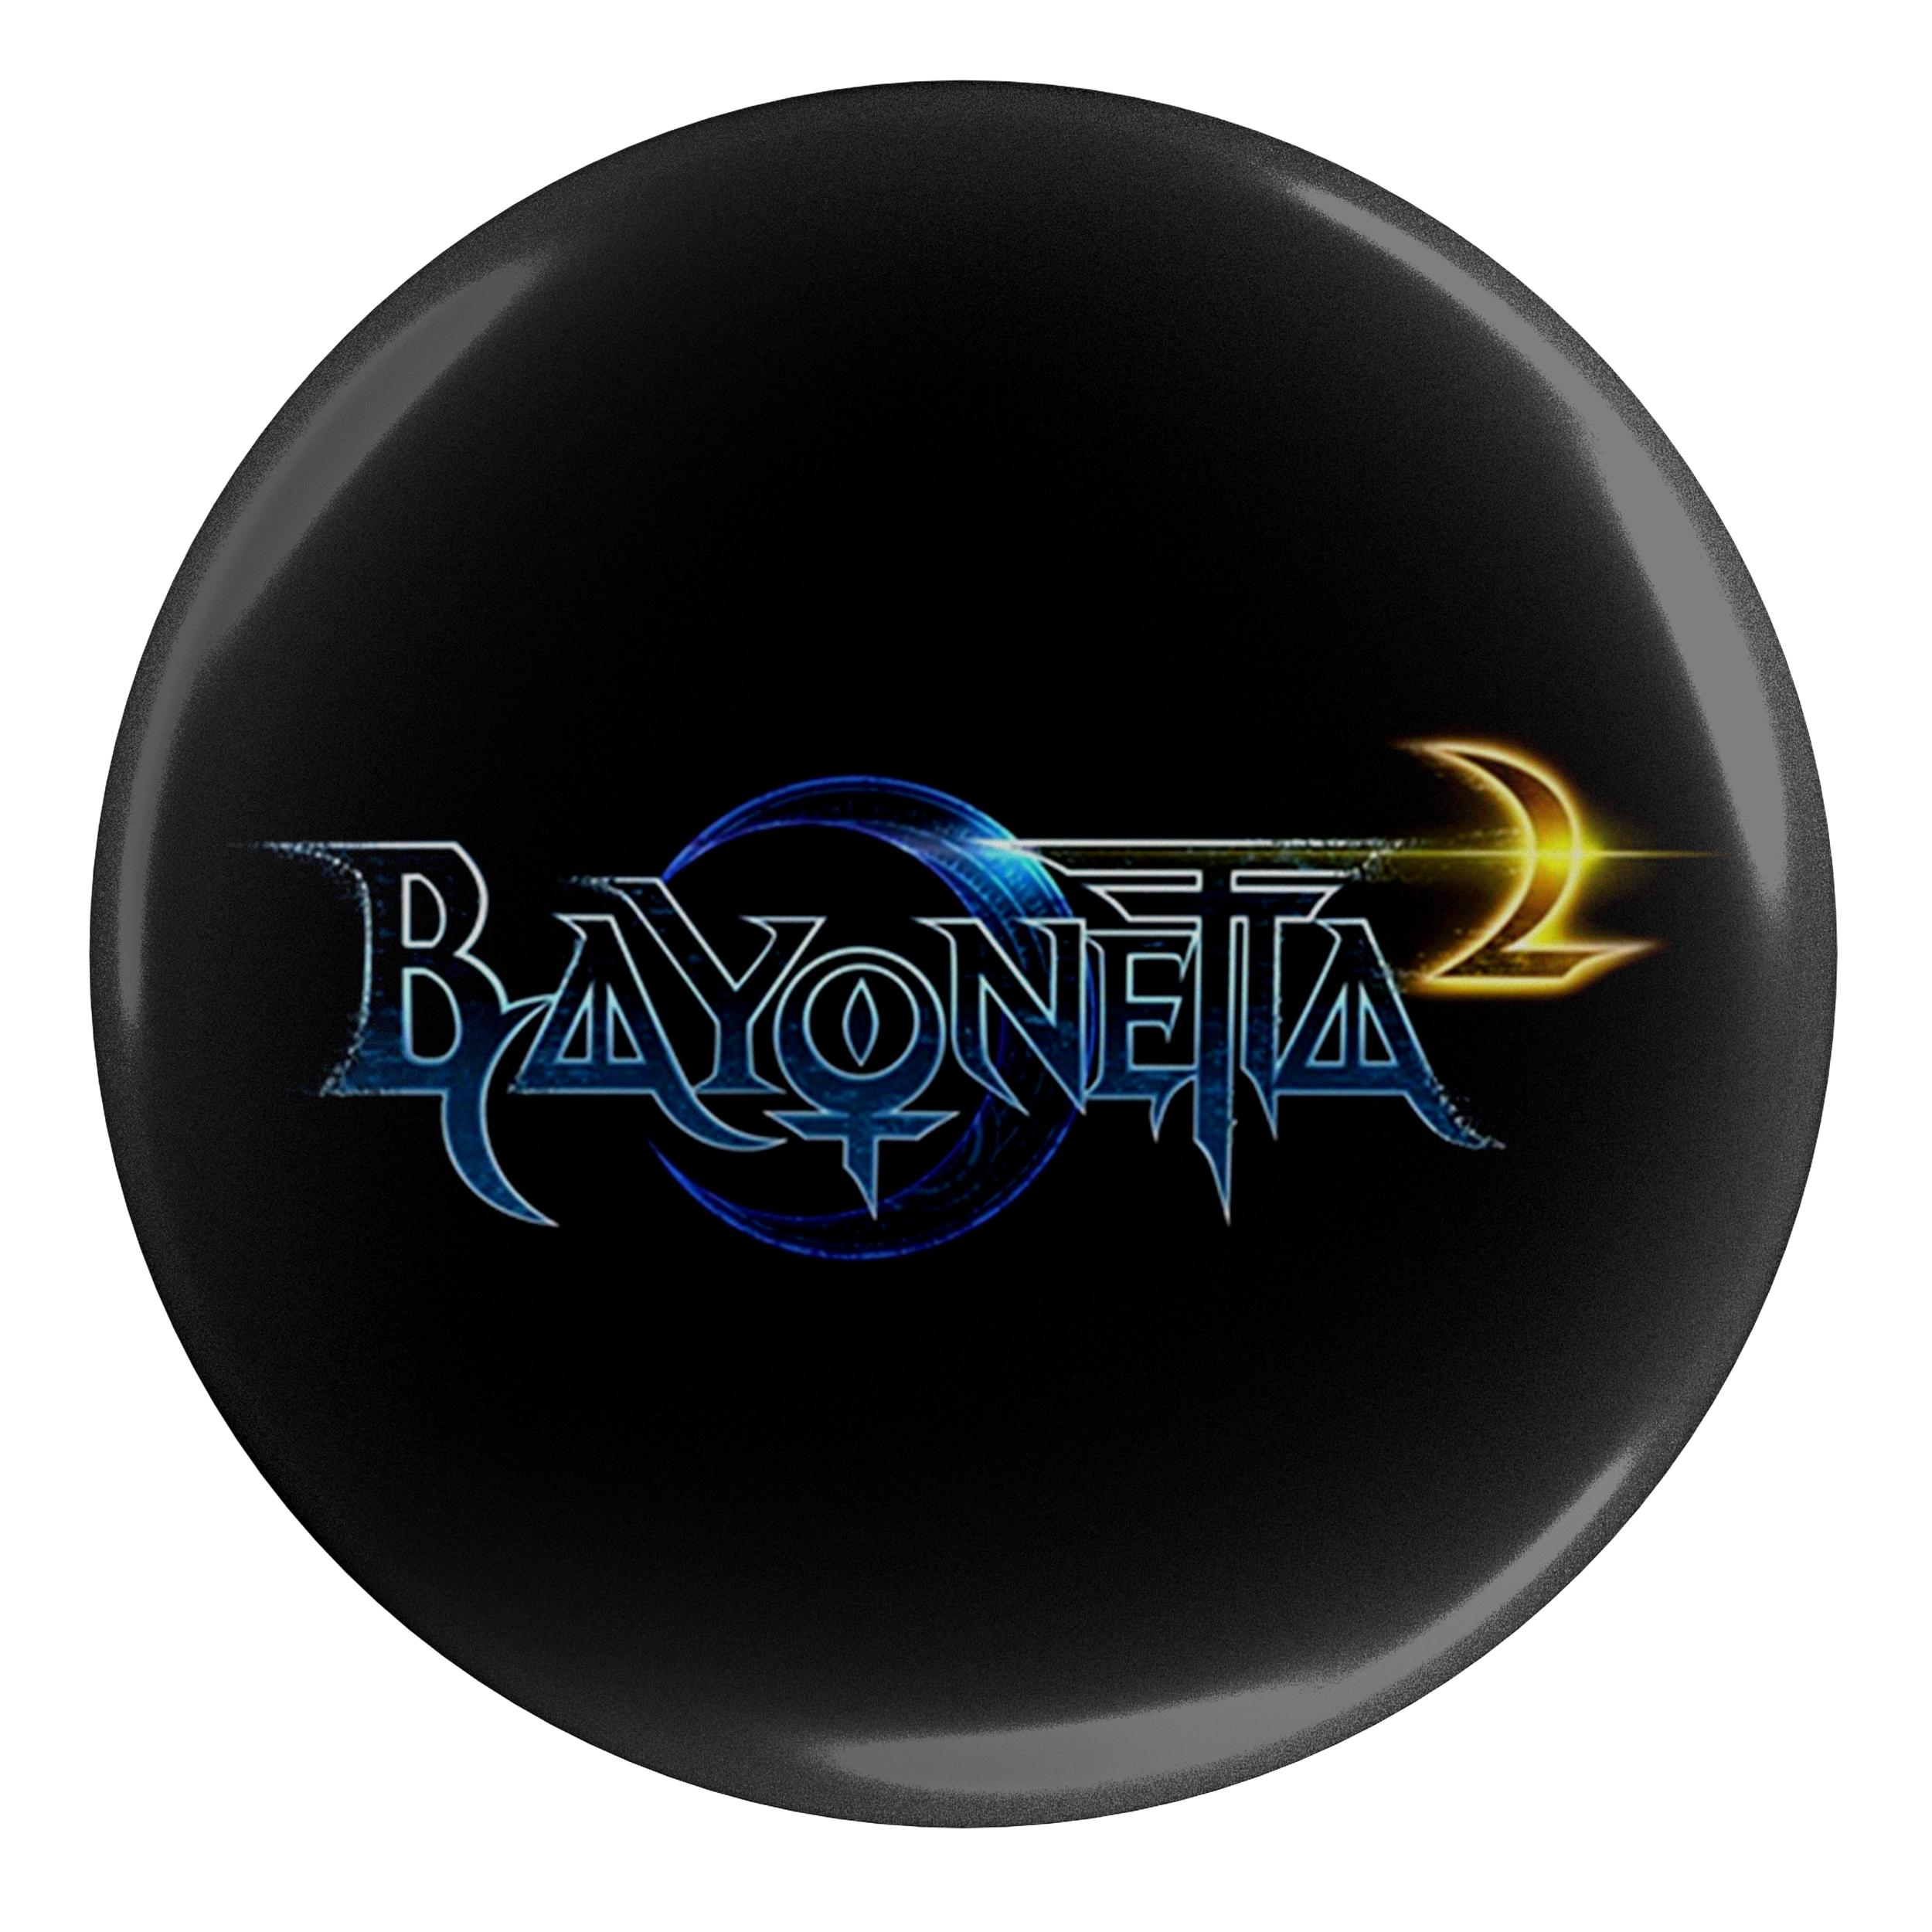 پیکسل طرح BAYONETTA مدل S1833